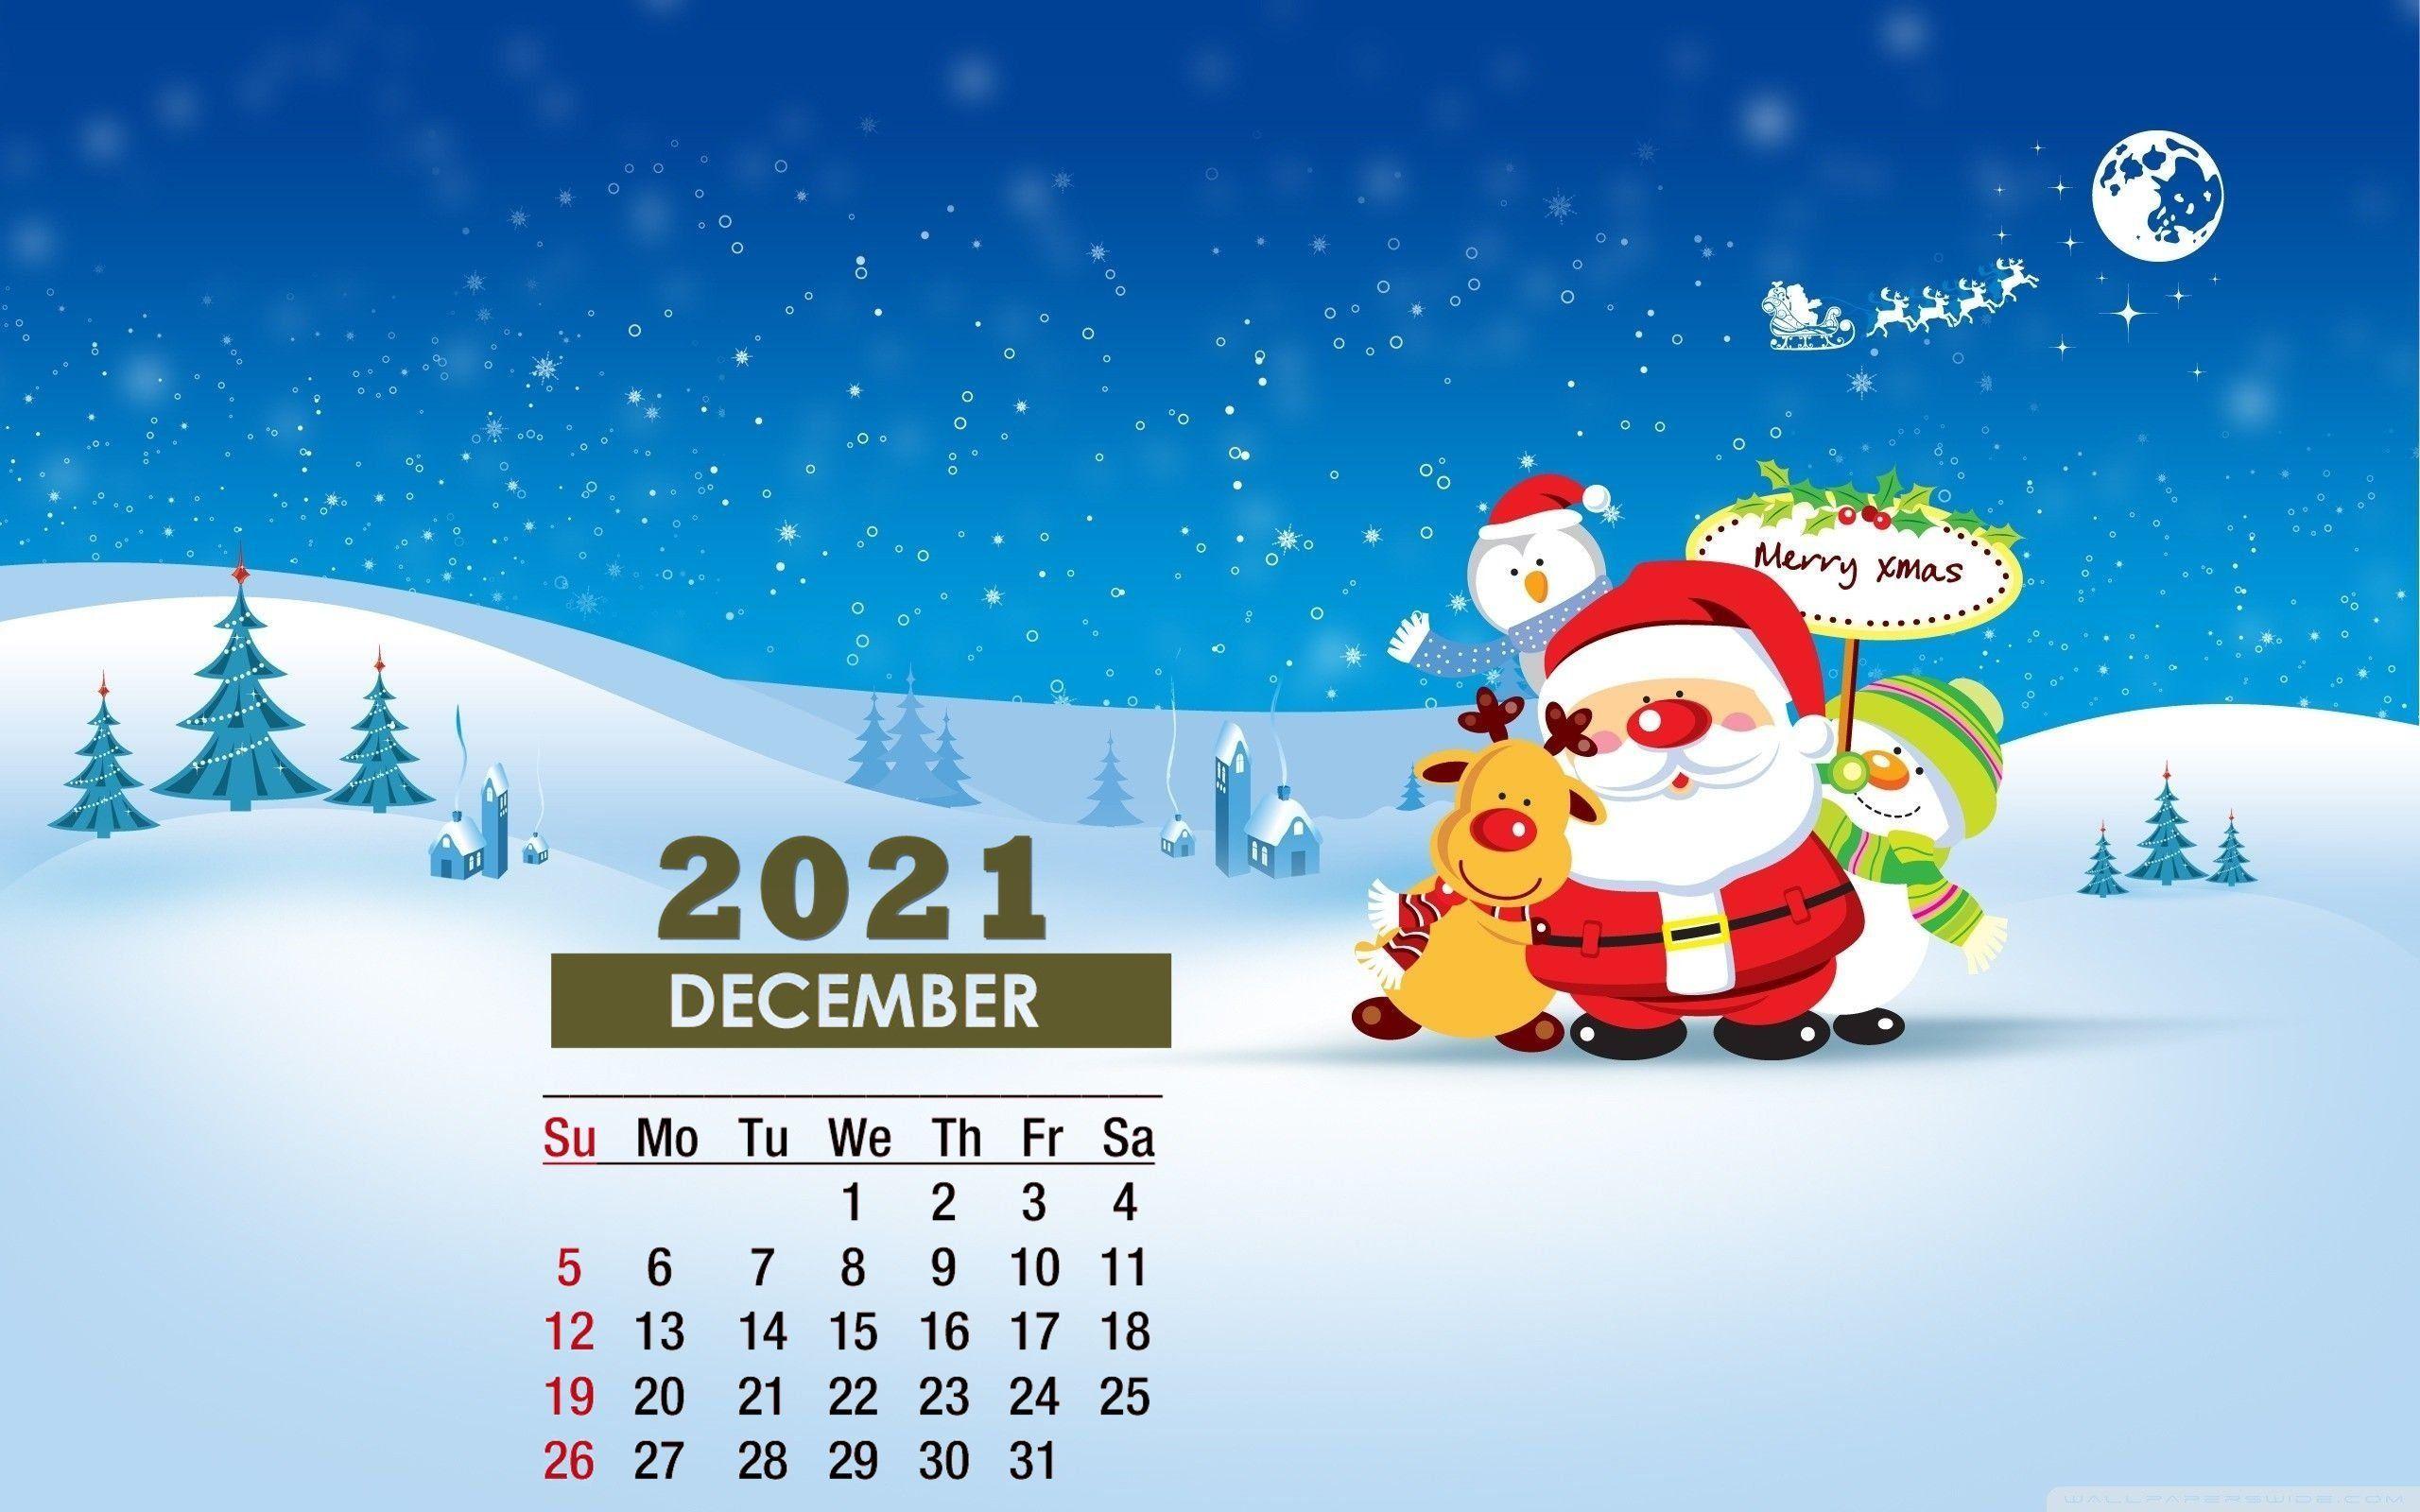 December 2021 Calendar Wallpaper For Desktop